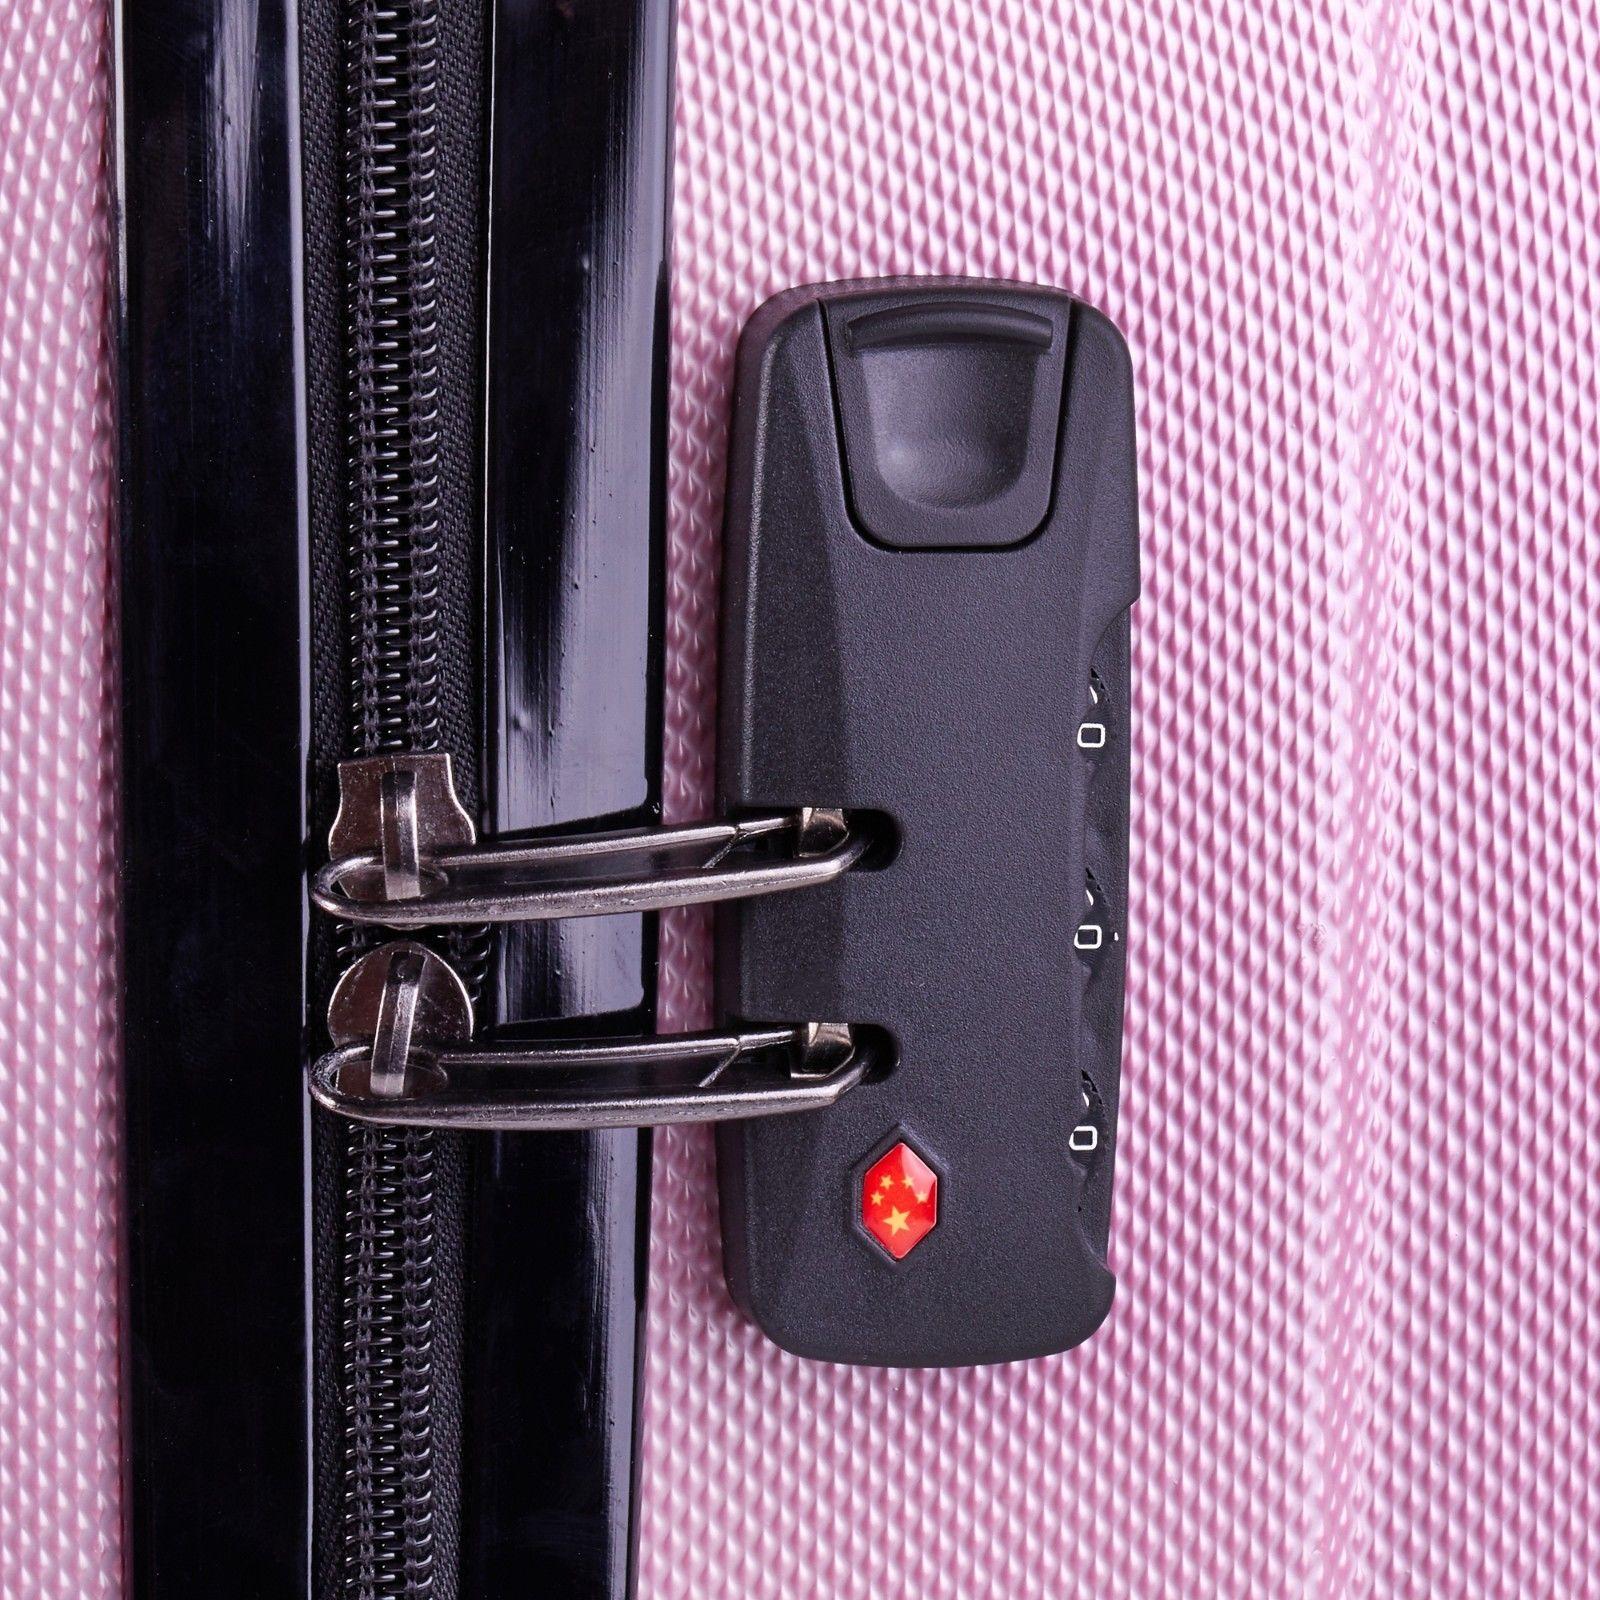 Milano-Premium-3pc-ABS-Luggage-Suitcase-Luxury-Hard-Case-Shockproof-Travel-Set thumbnail 28